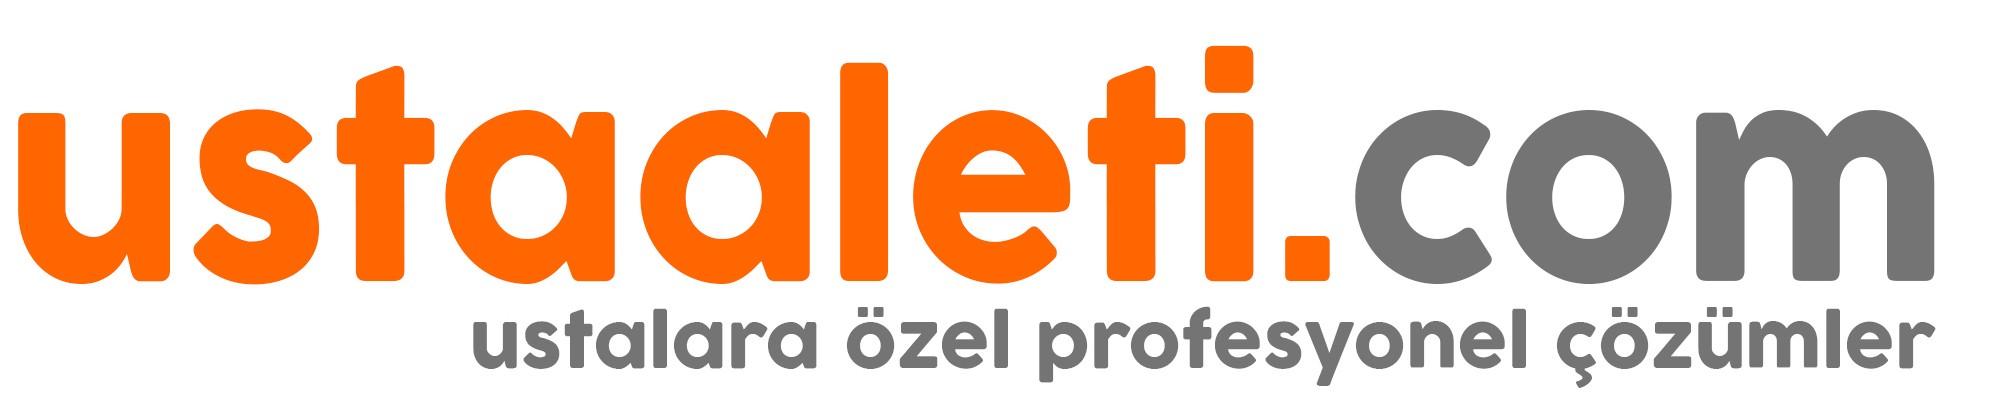 ustaaleti.com